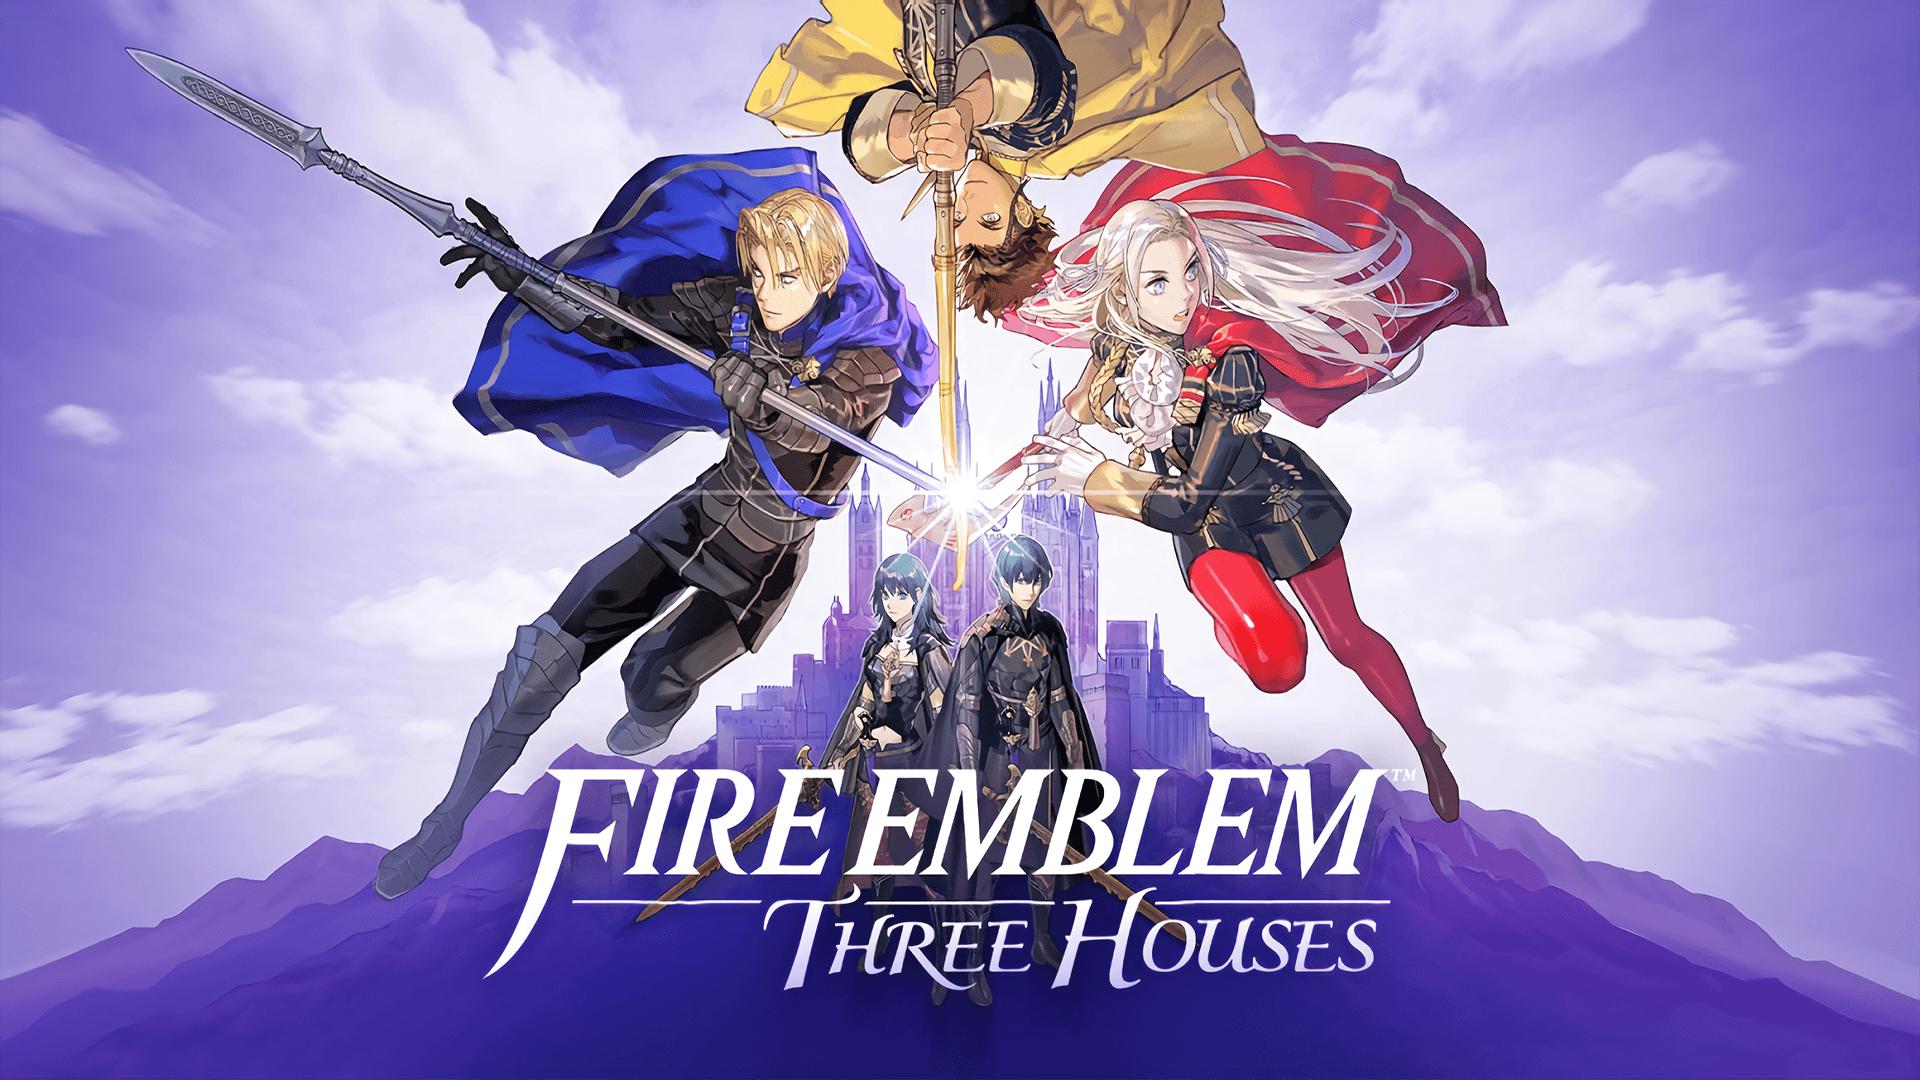 Fire Emblem: Three Houses HD Wallpapers - Wallpaper Cave